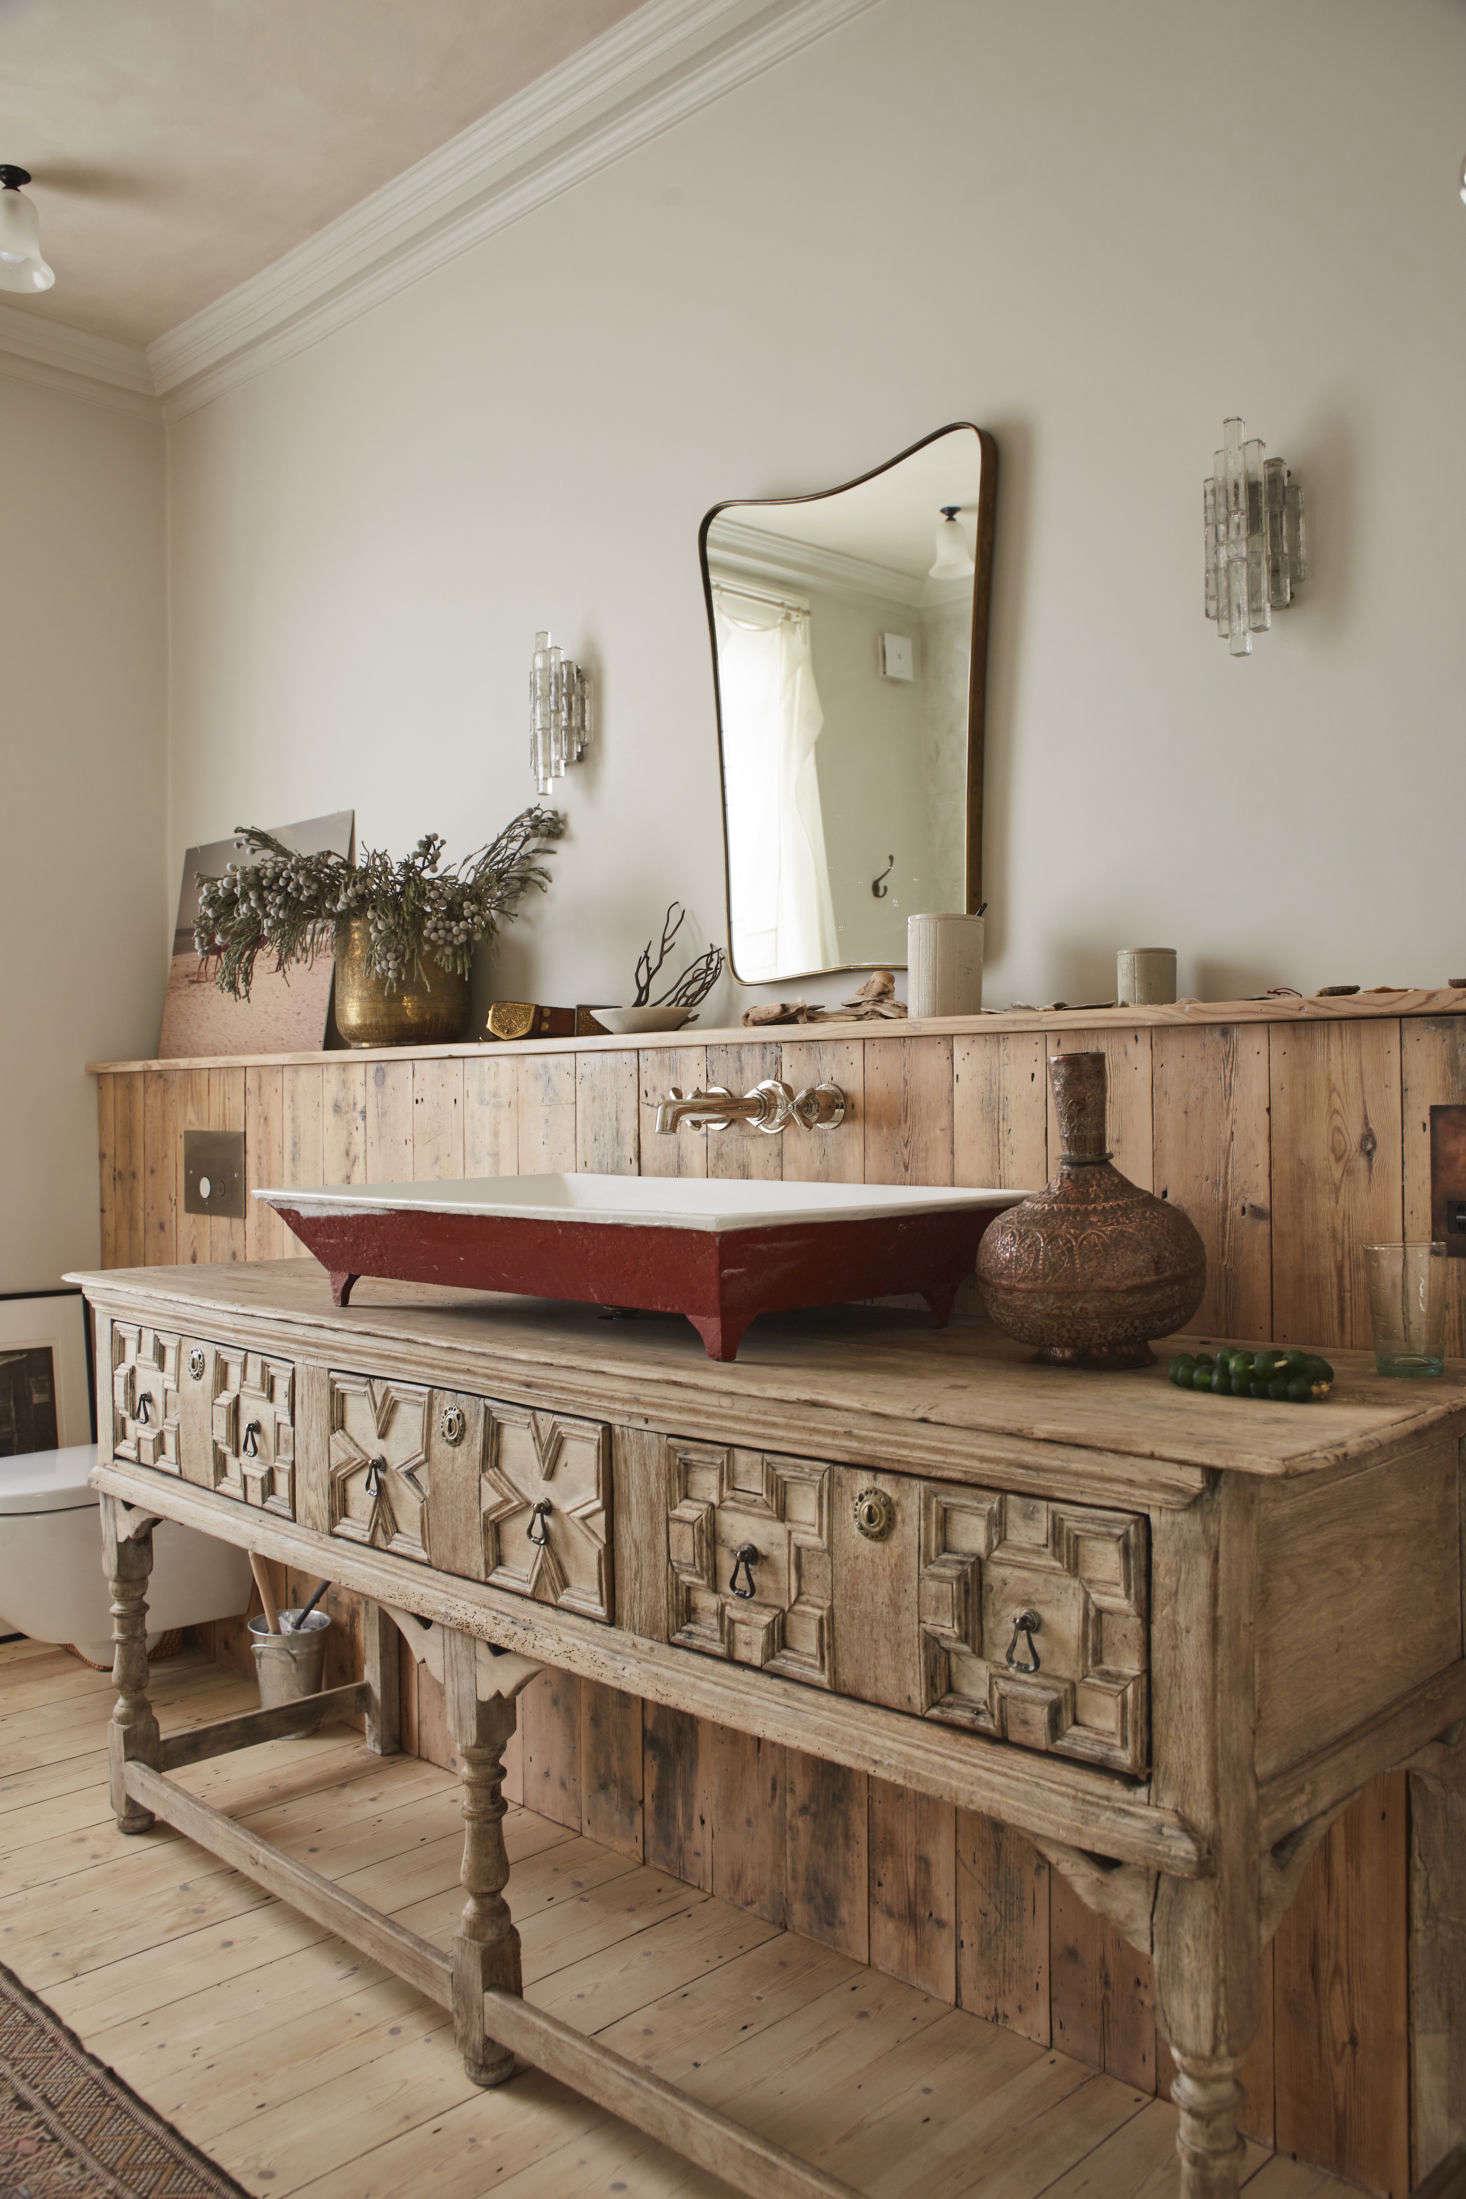 Antique sideboard as bathroom sink table, rRetrouvius design, London. Tom Fallon photo.